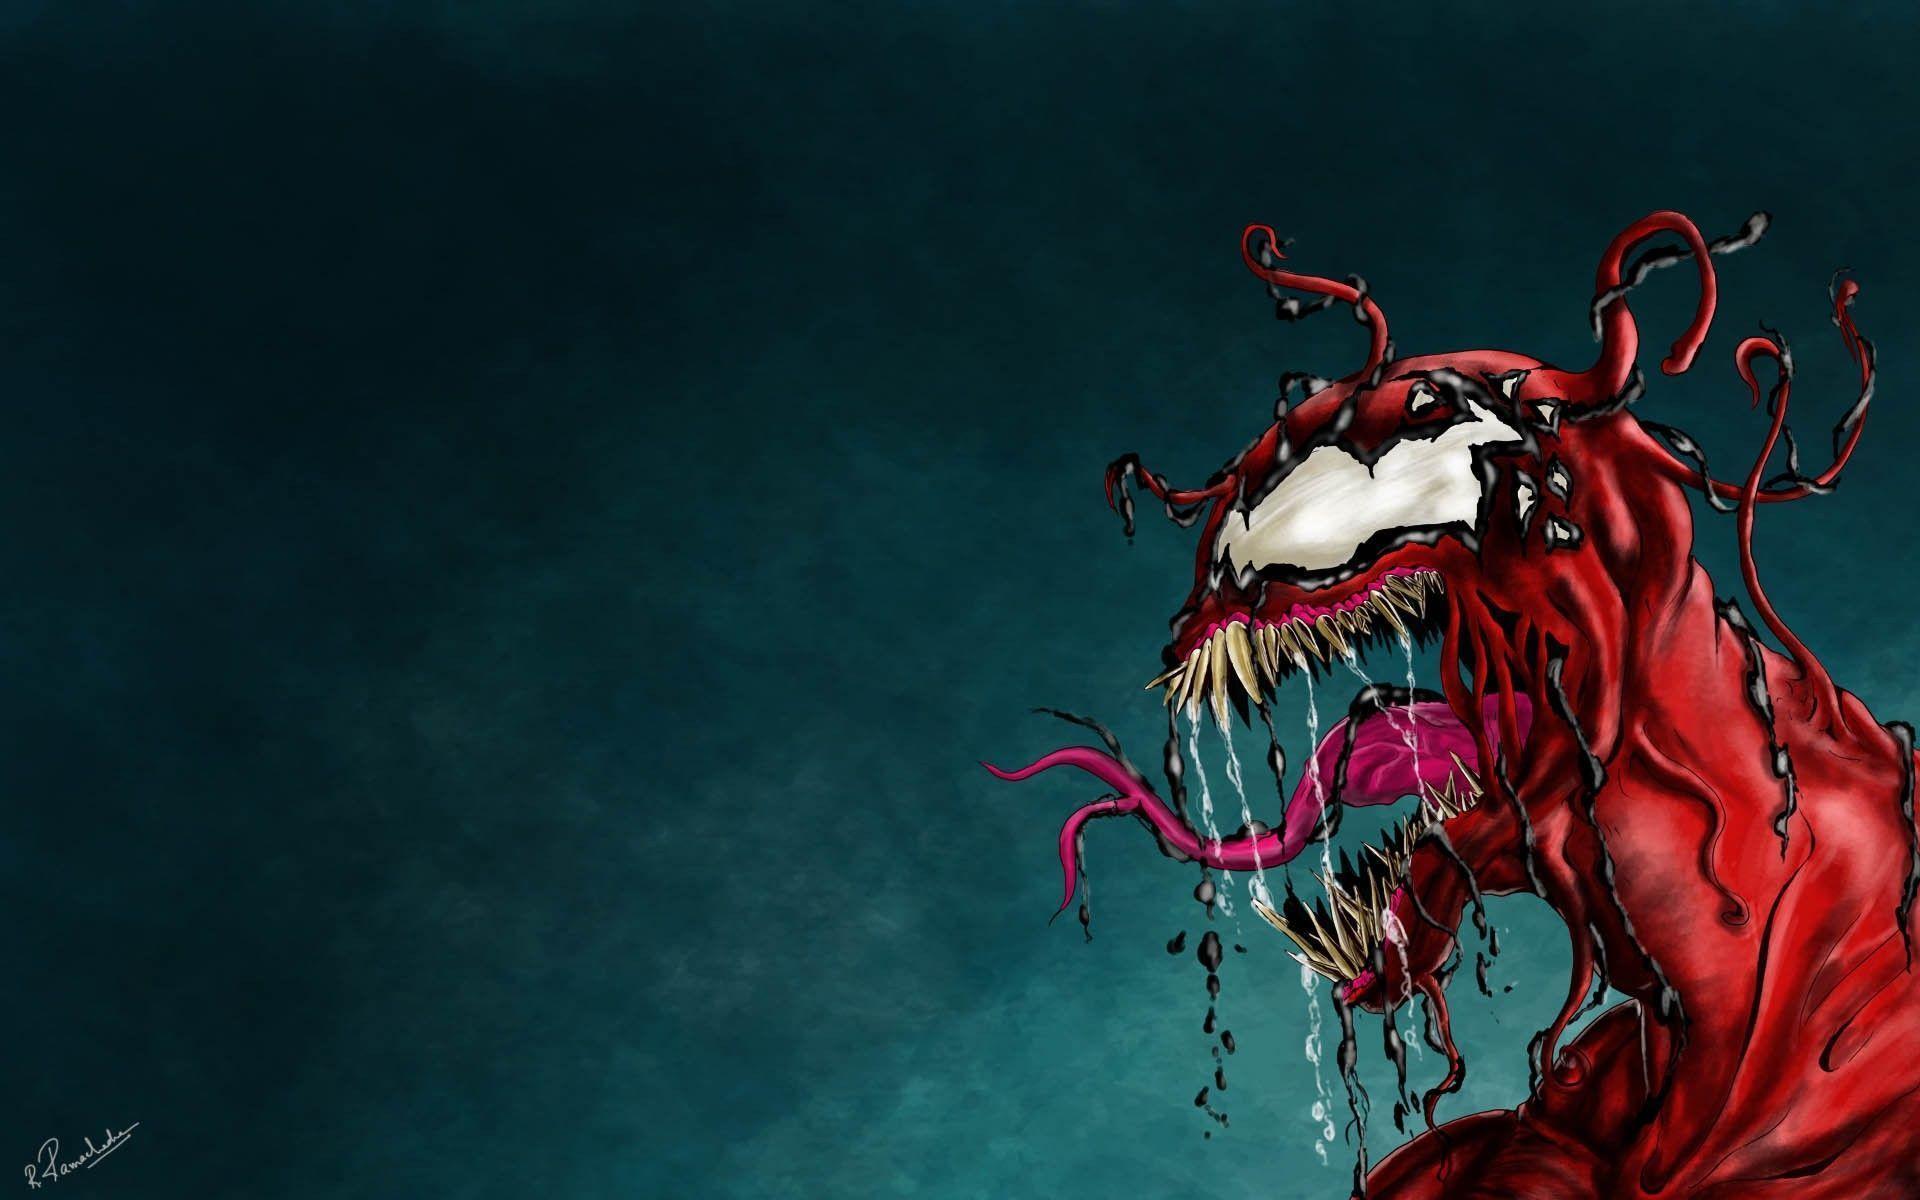 venom hd wallpaper iphone - photo #21